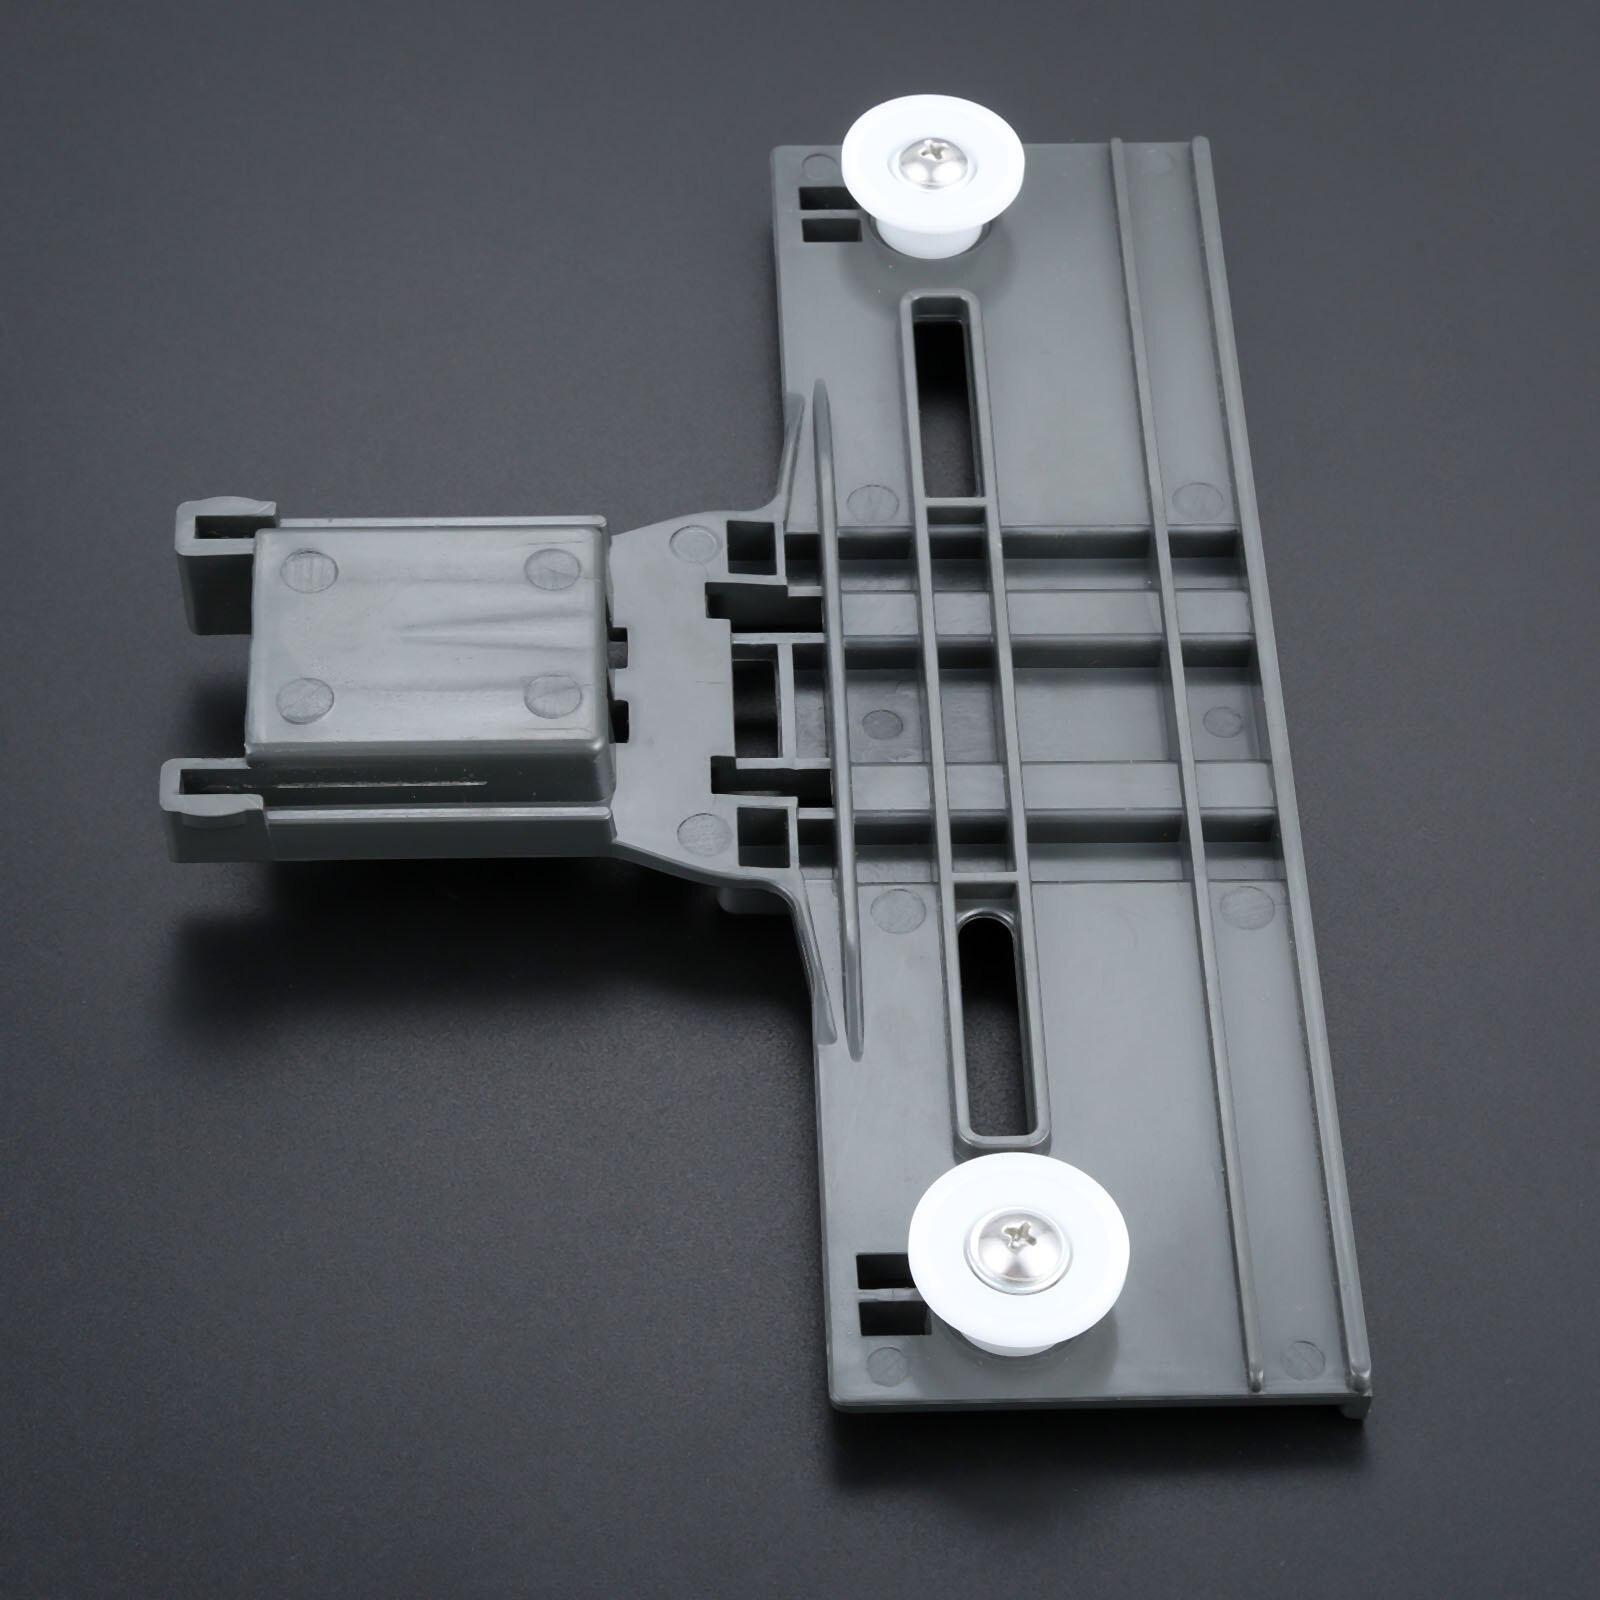 W10350375 Dishwasher Upper Rack Kit Replace W10250159 W10712395 LP22842 2117794 AH3501852